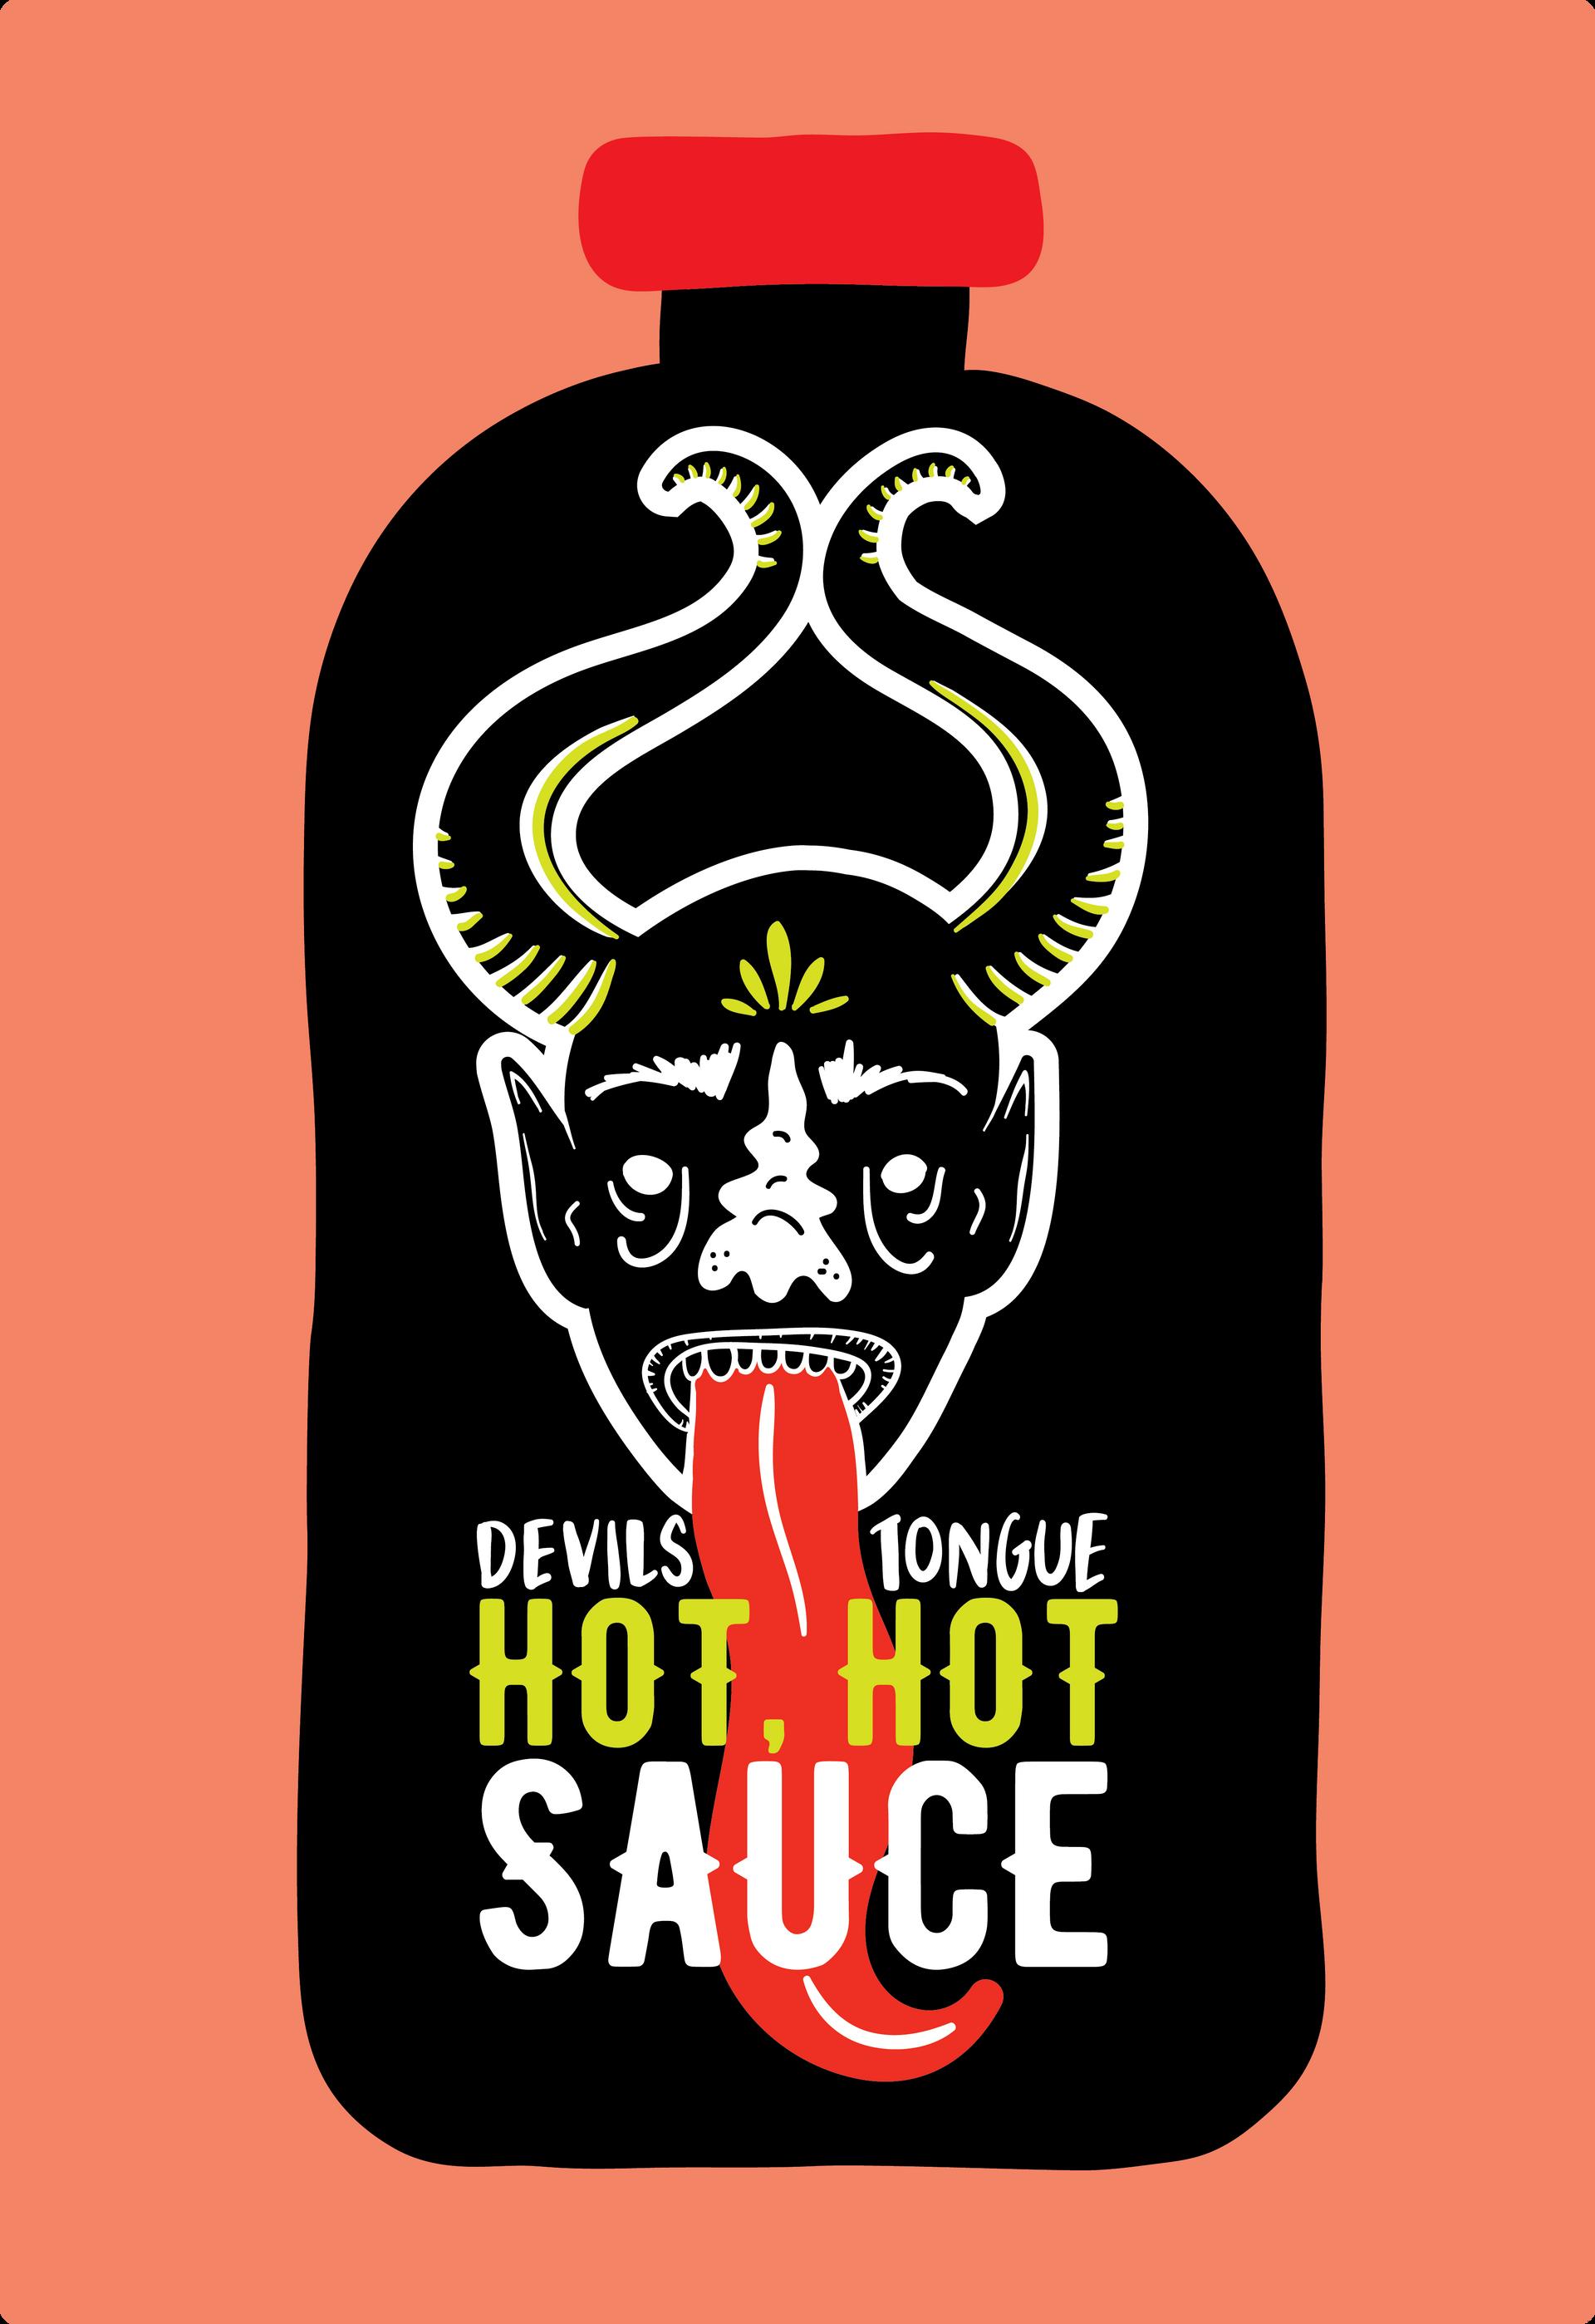 Hot Sauce Bottle Design